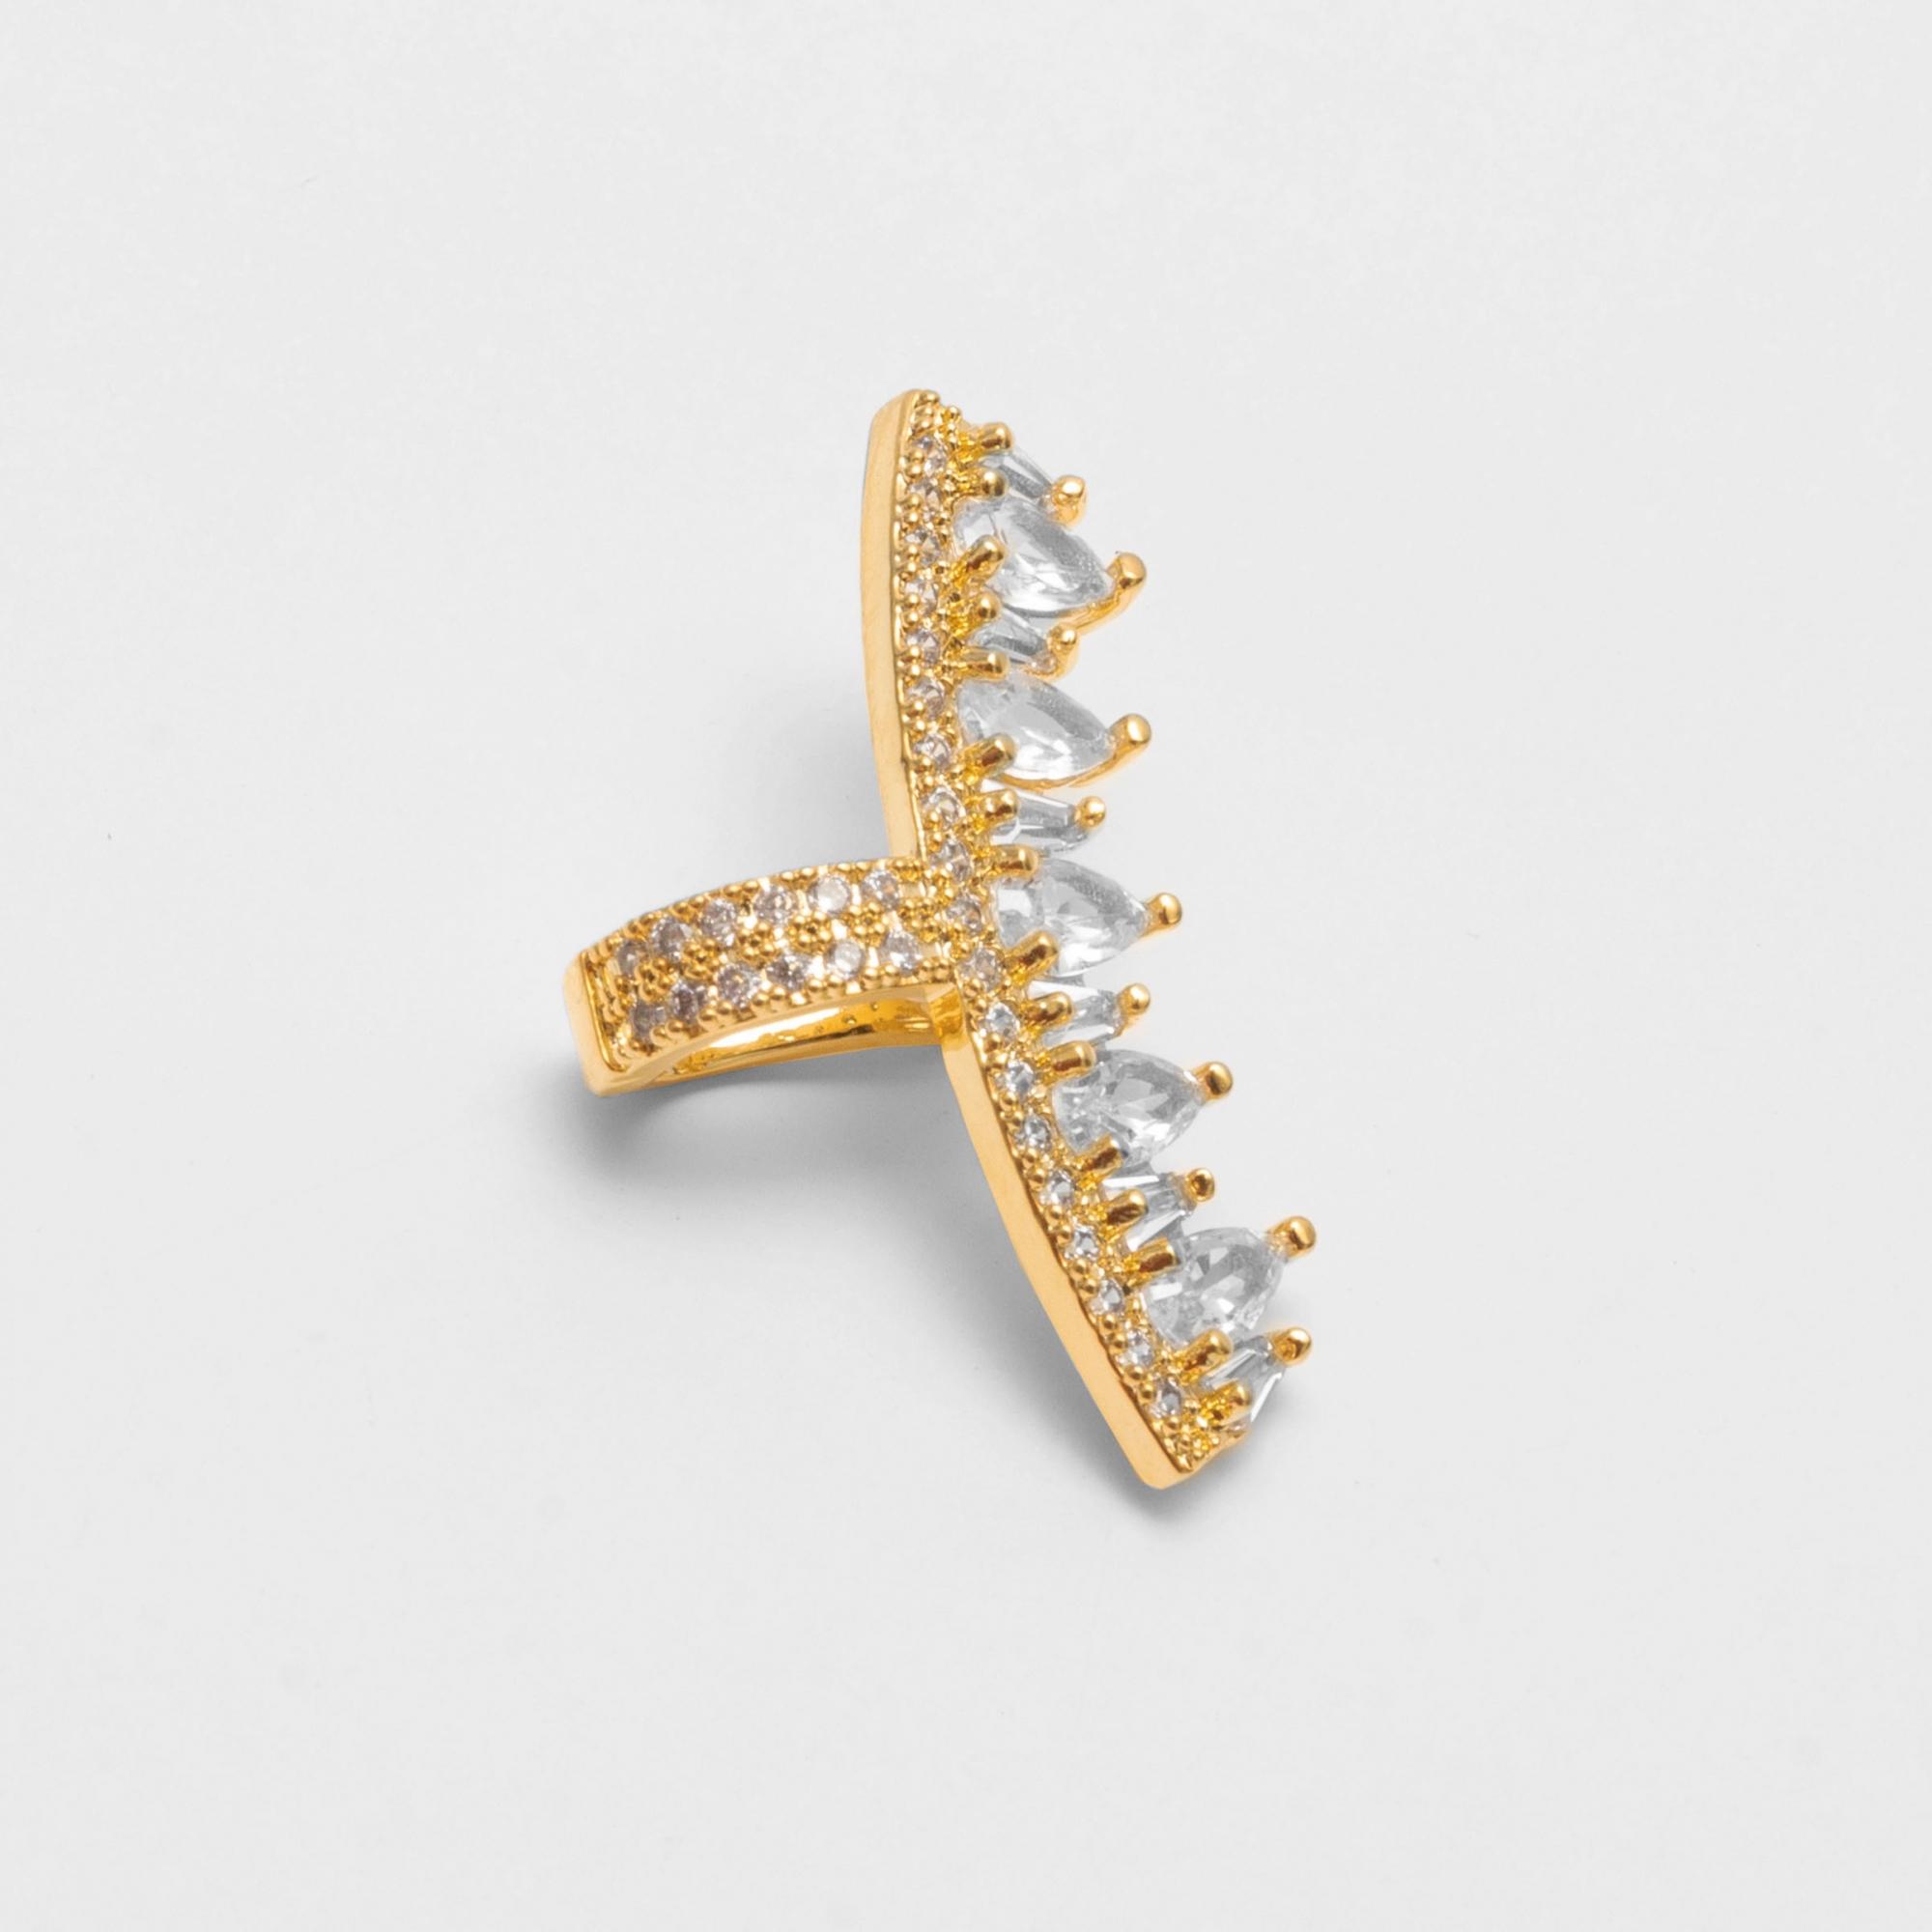 Brinco Piercing Fake Ear Cuff Gotas Folheado a Ouro 18k  - Lunozê Joias